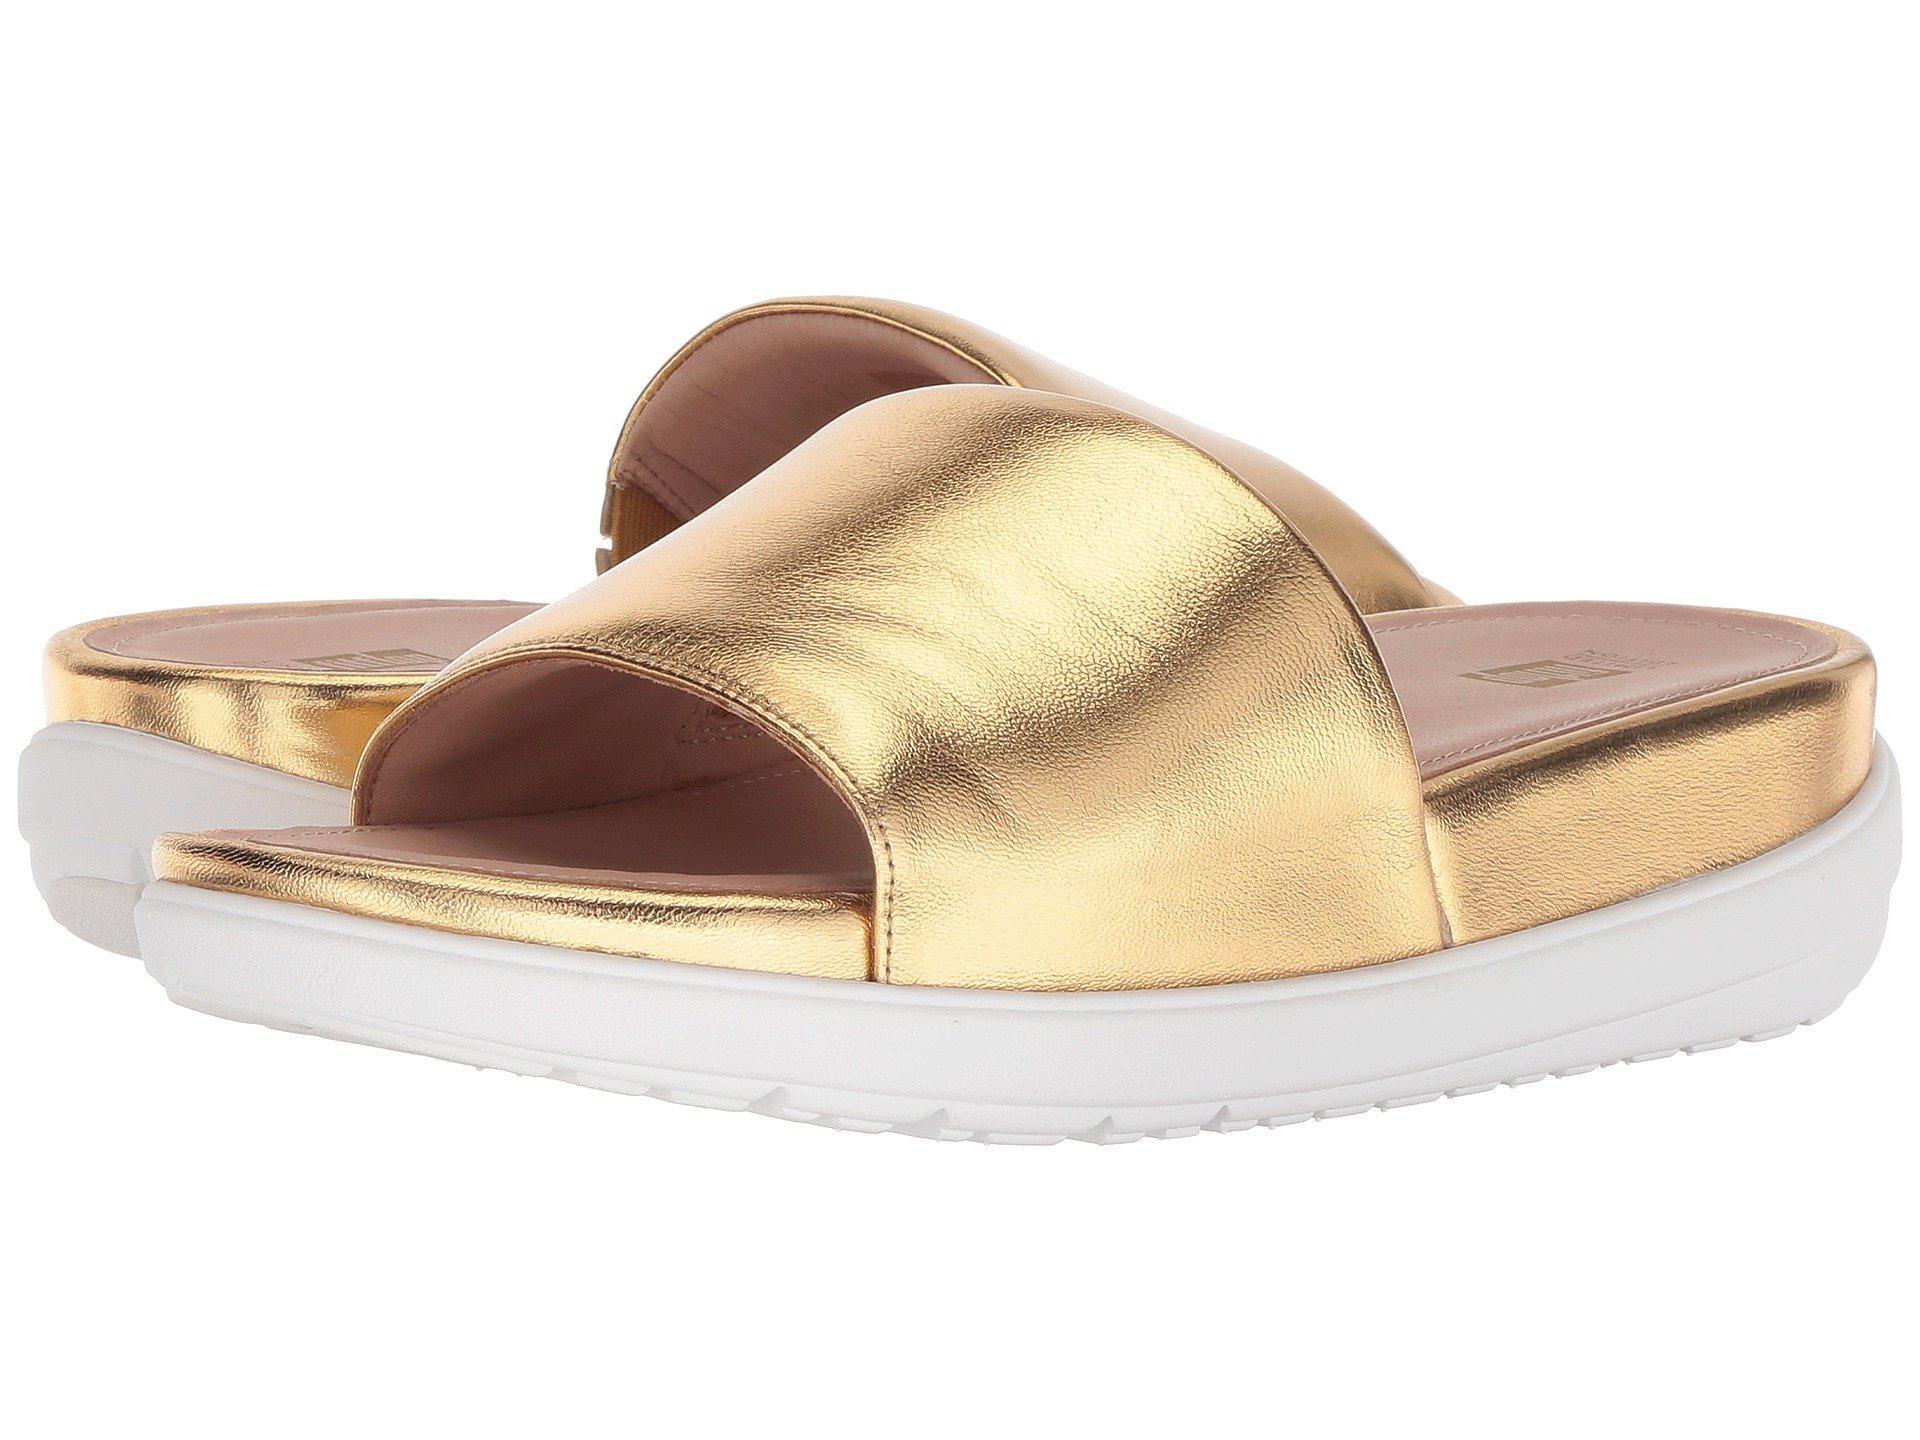 93c9da88be89d3 Lyst - Fitflop Loosh Luxetm Leather Slide Sandals (gold Metallic ...